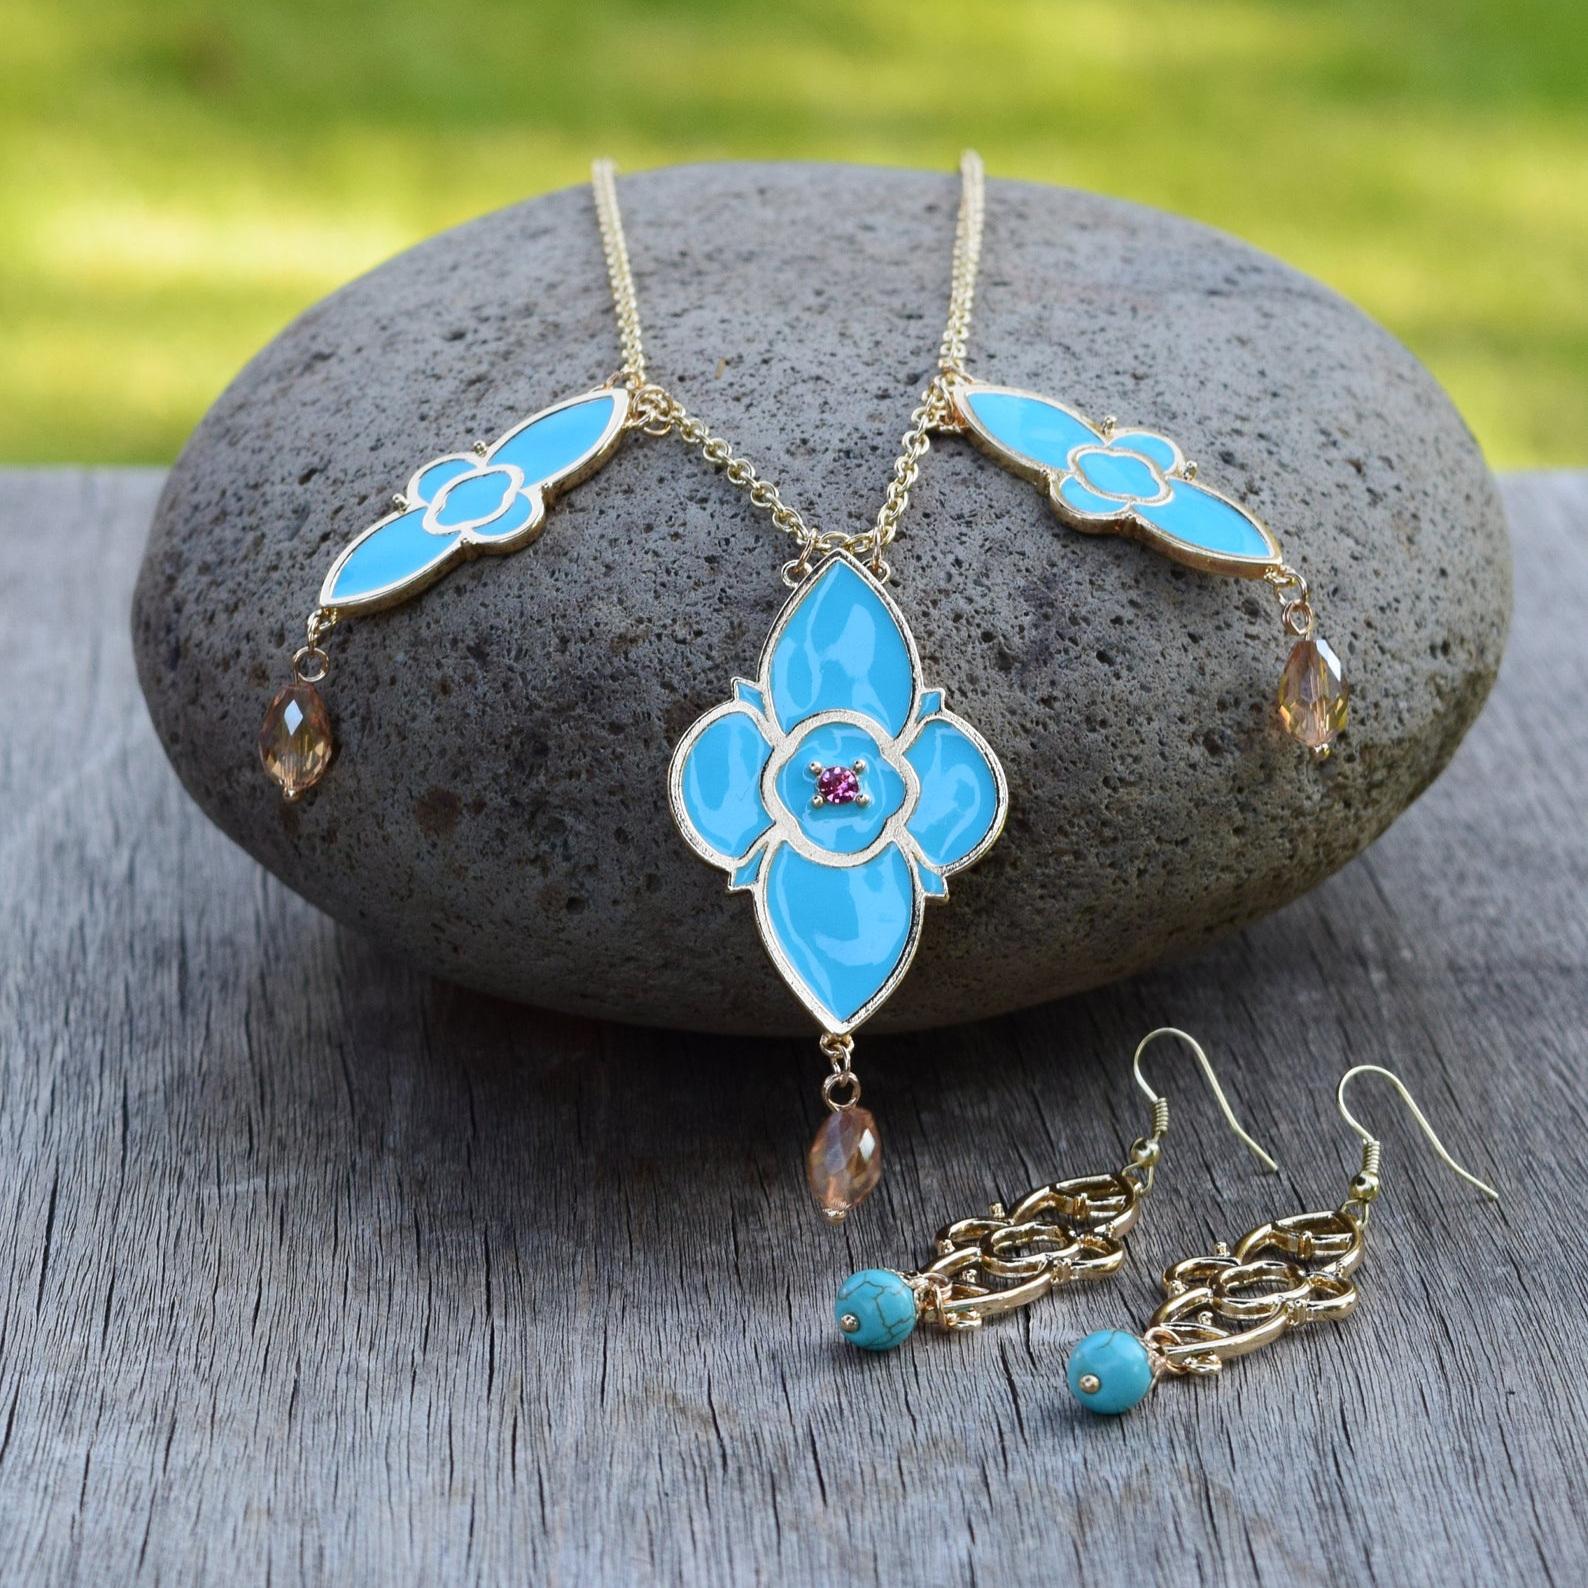 jasmine+necklace+and+earrings.jpg